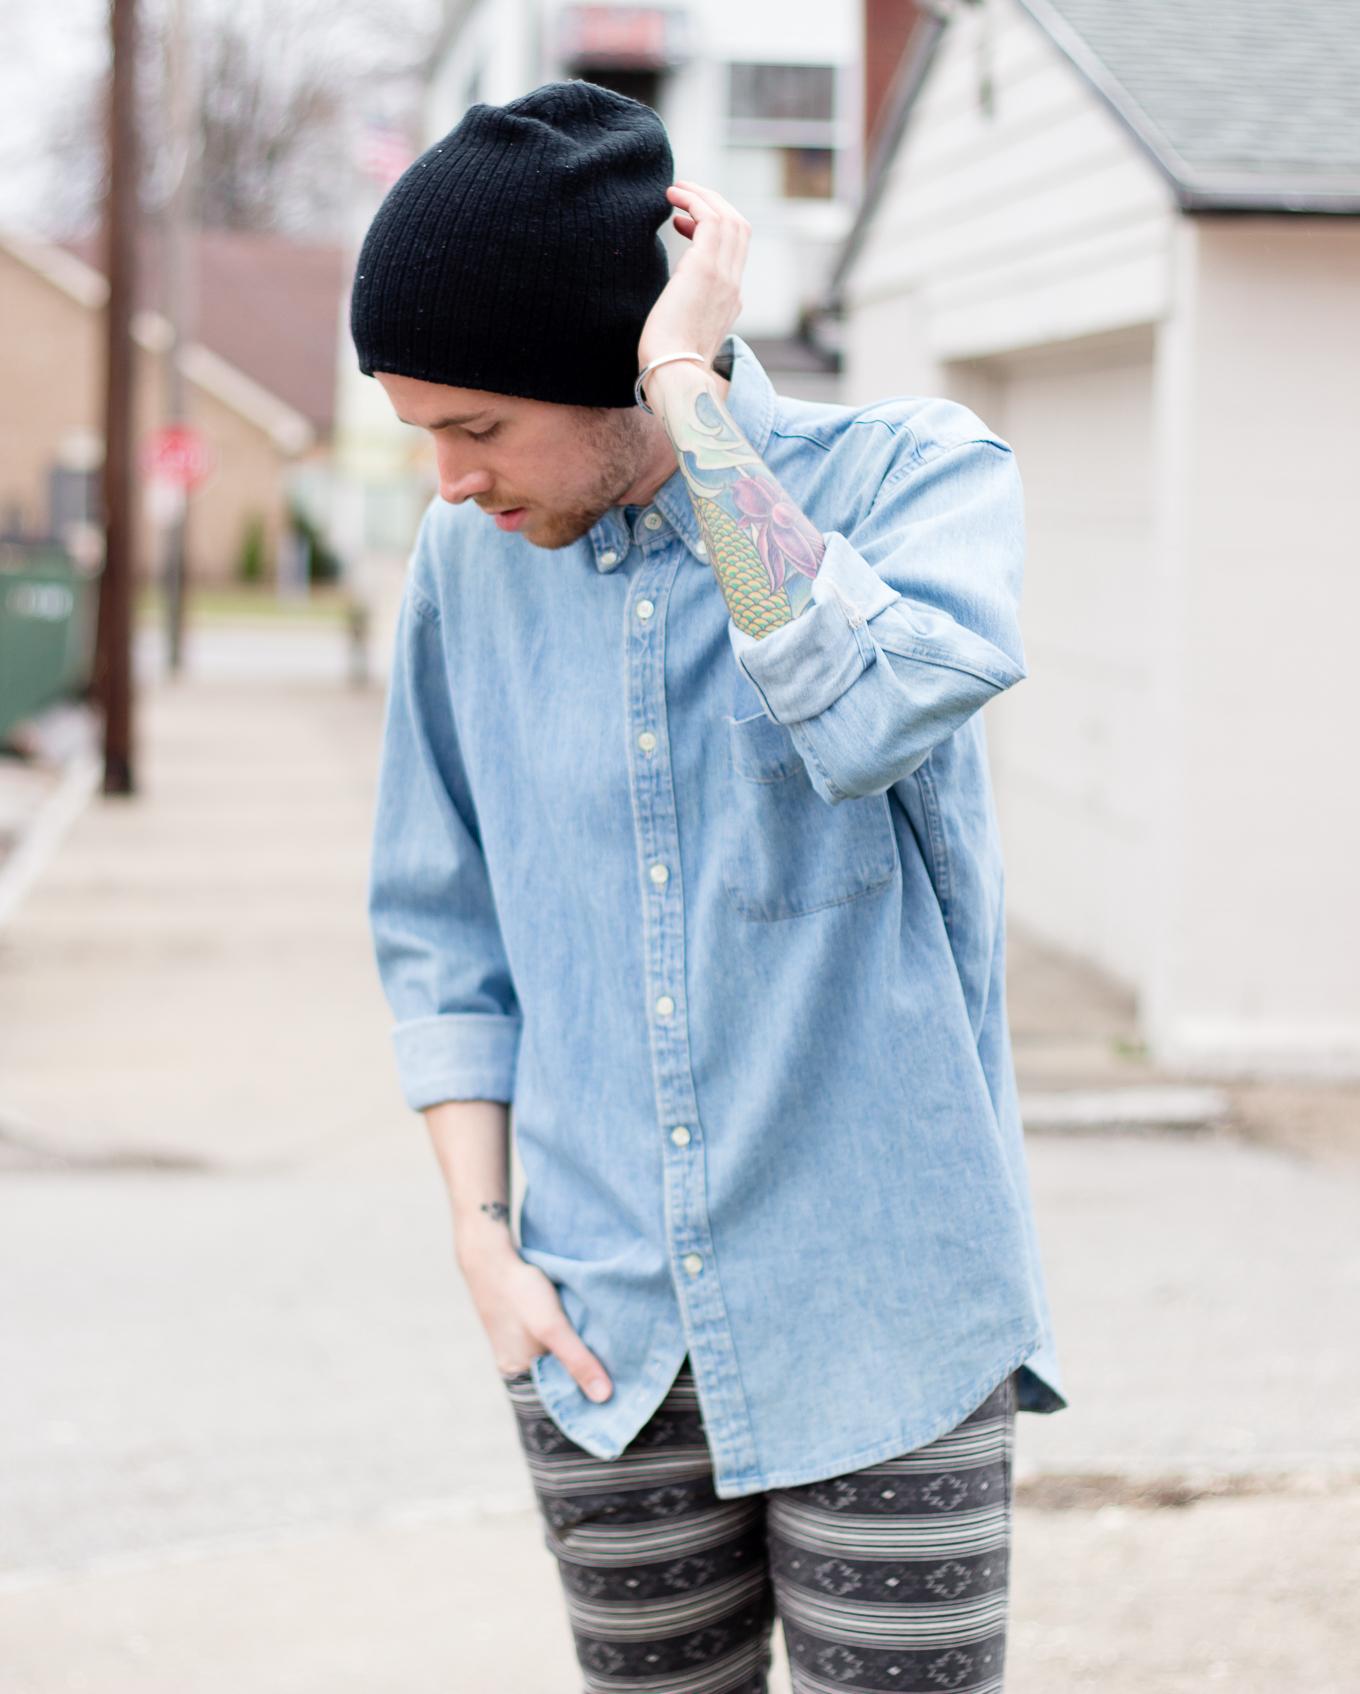 J. Crew Denim Shirt and Kill City Jeans - The Kentucky Gent